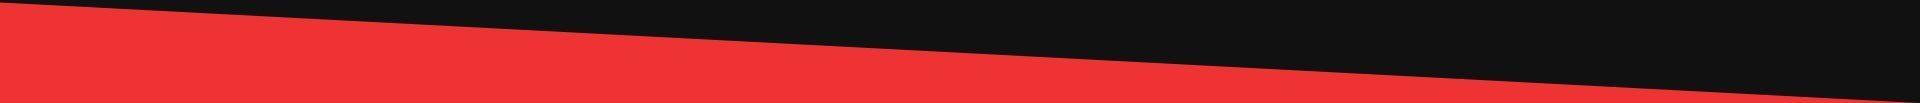 https://kibo-robo.jp/wp-content/uploads/2017/03/red-triangle-1920x103.jpg